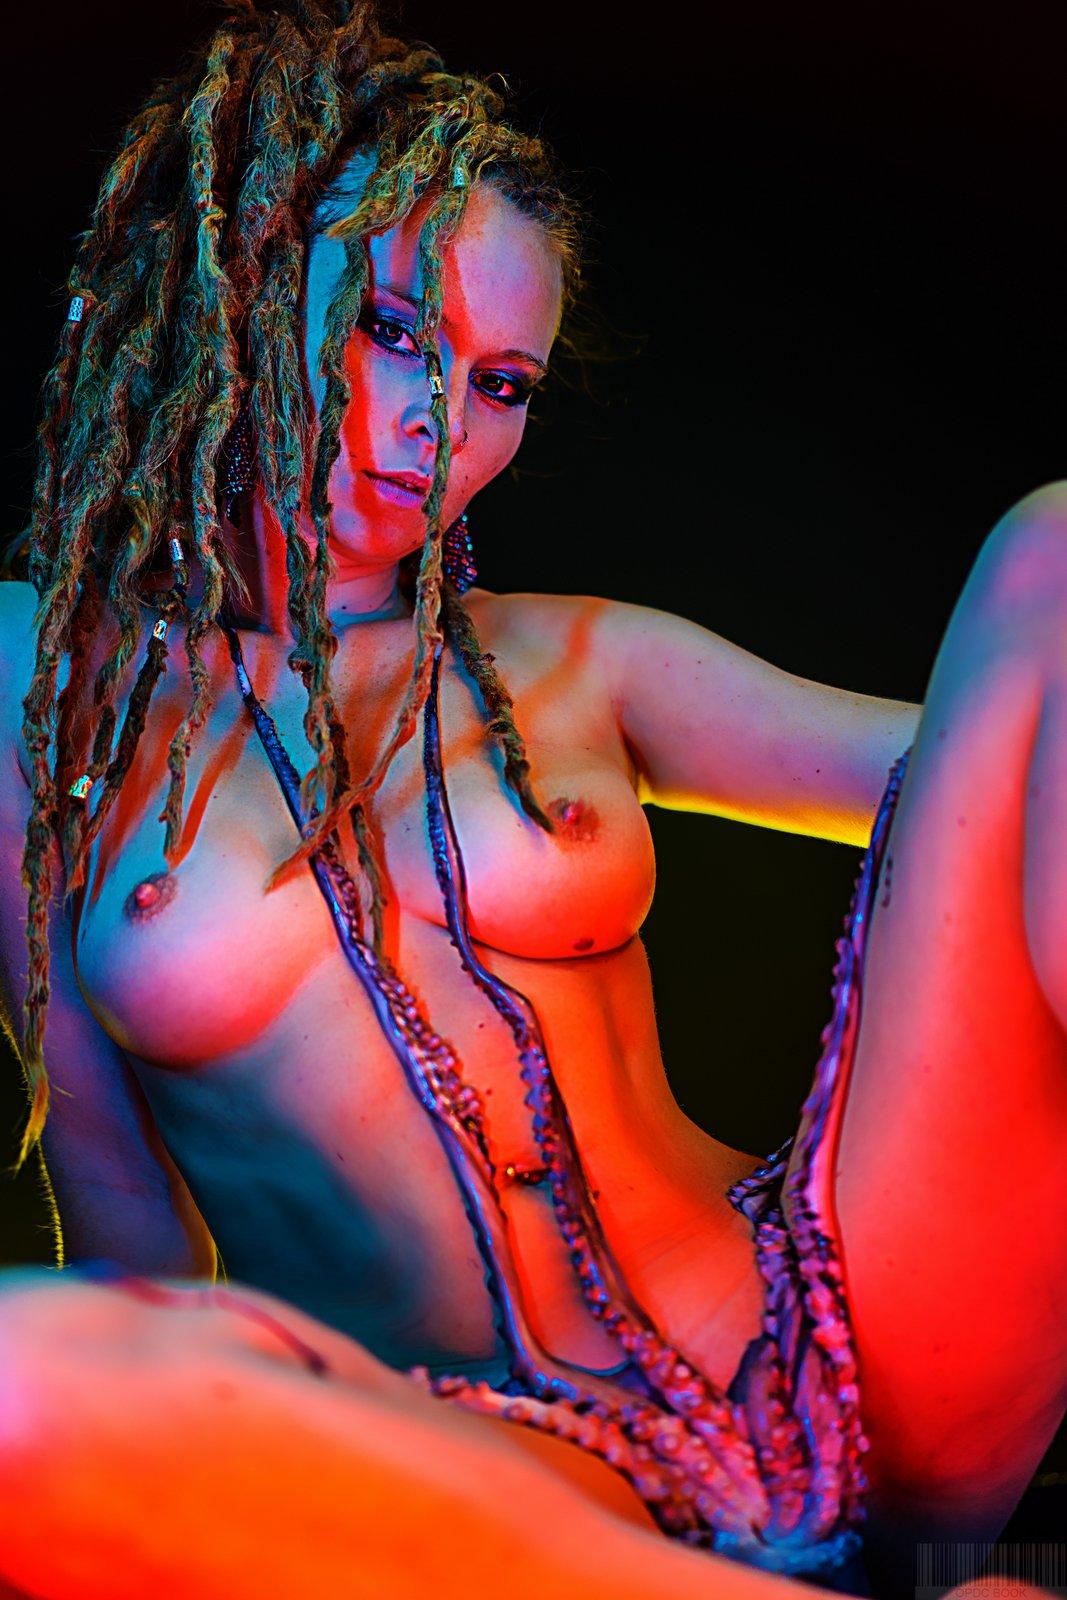 Art porno alternatif